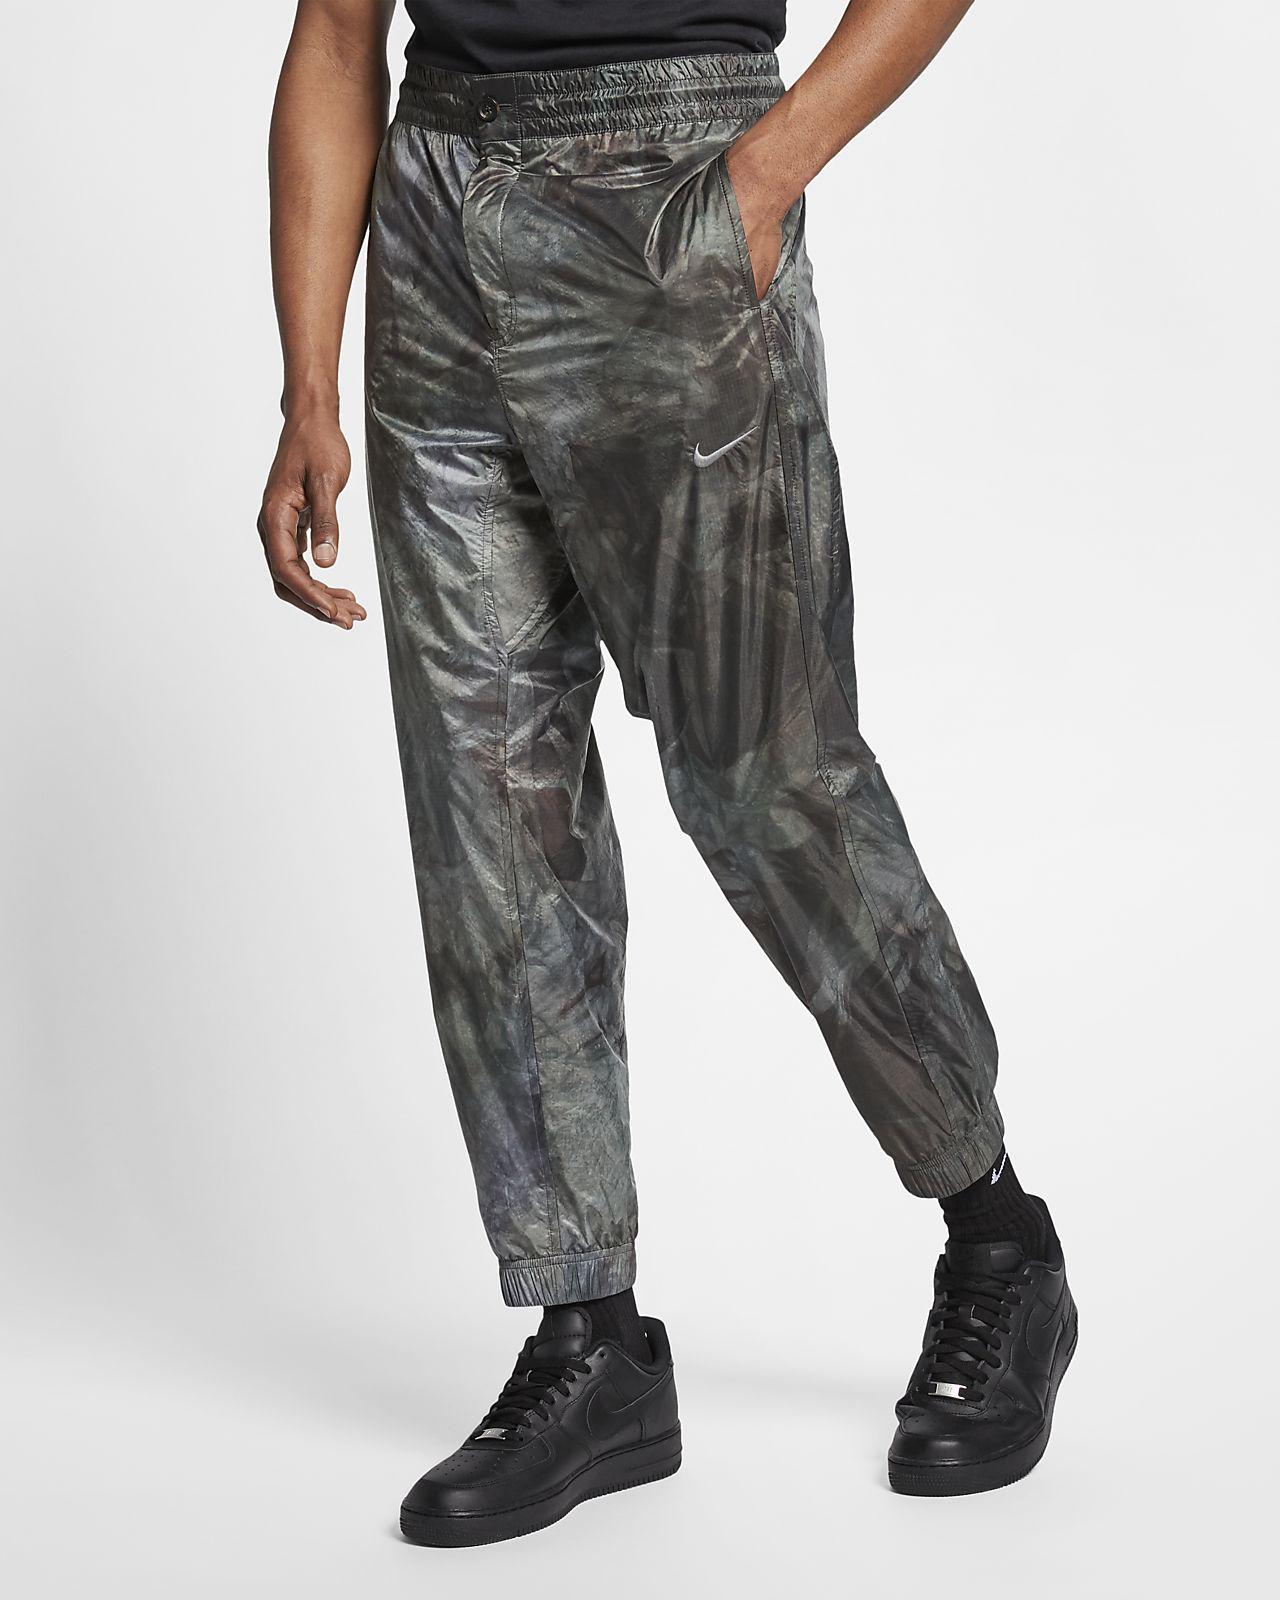 pantalon de surv tement nikelab made in italy collection. Black Bedroom Furniture Sets. Home Design Ideas